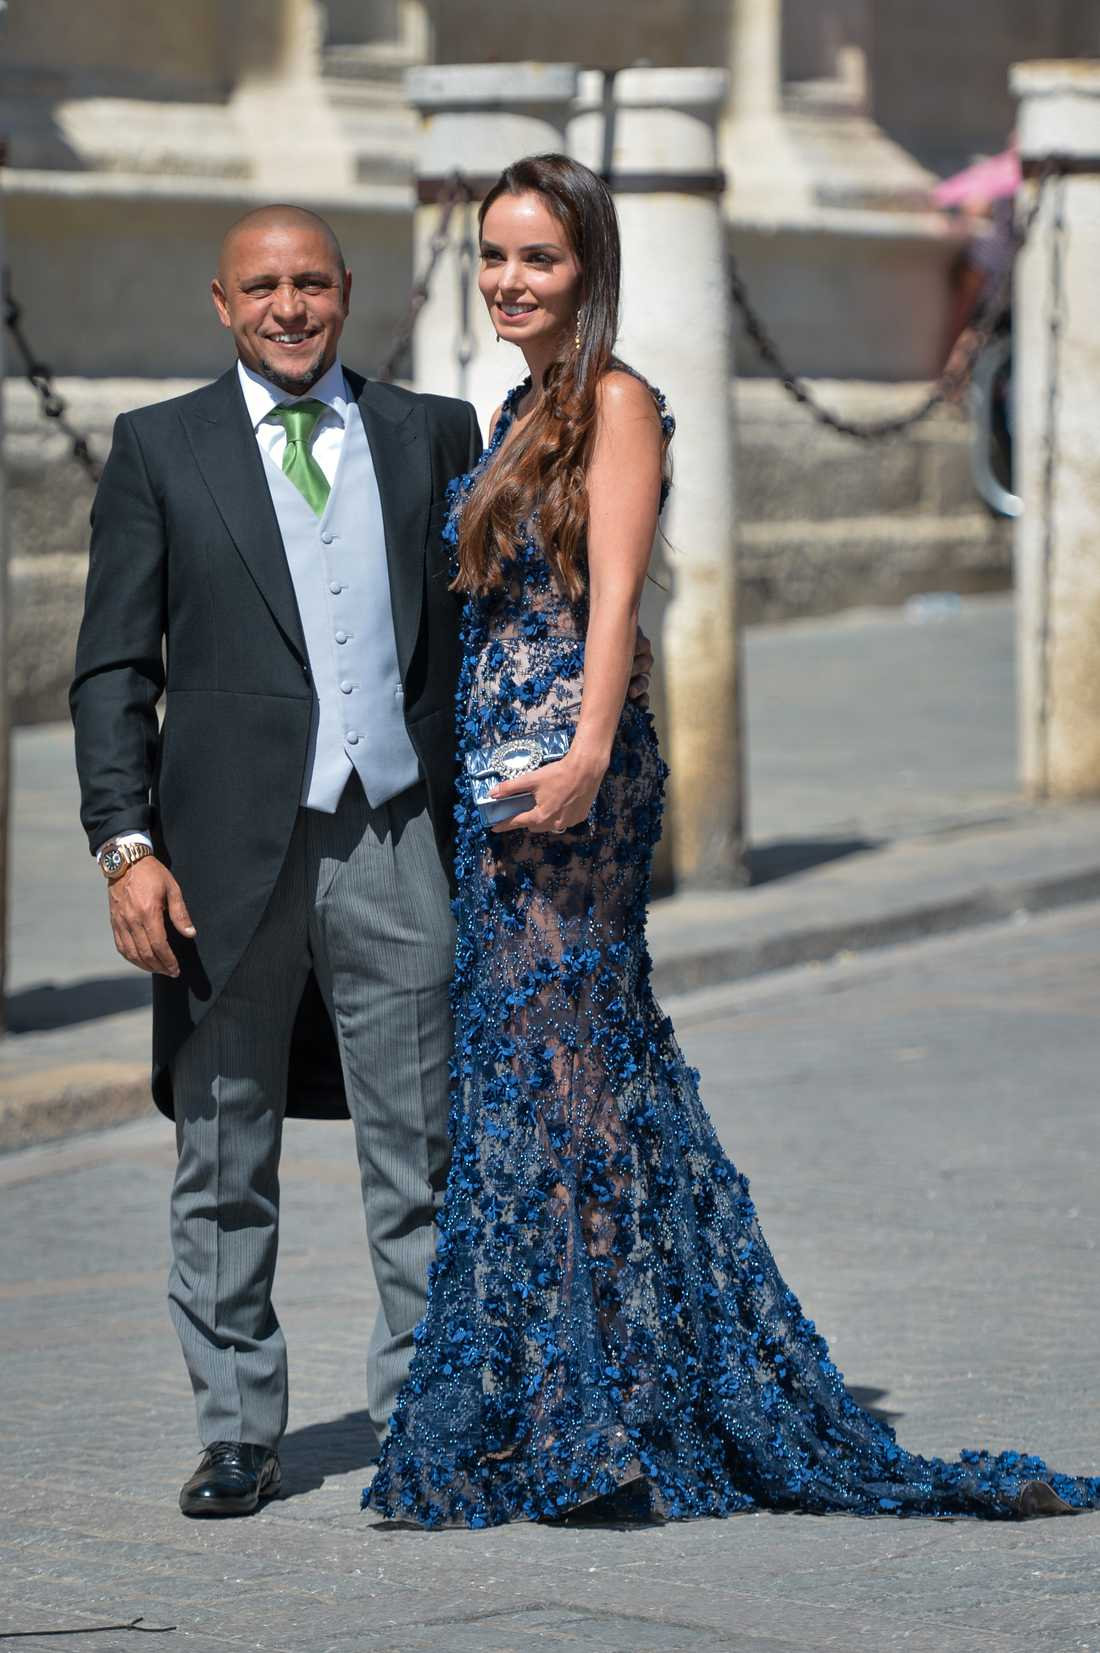 Roberto Carlos med frun Mariana Luccon.